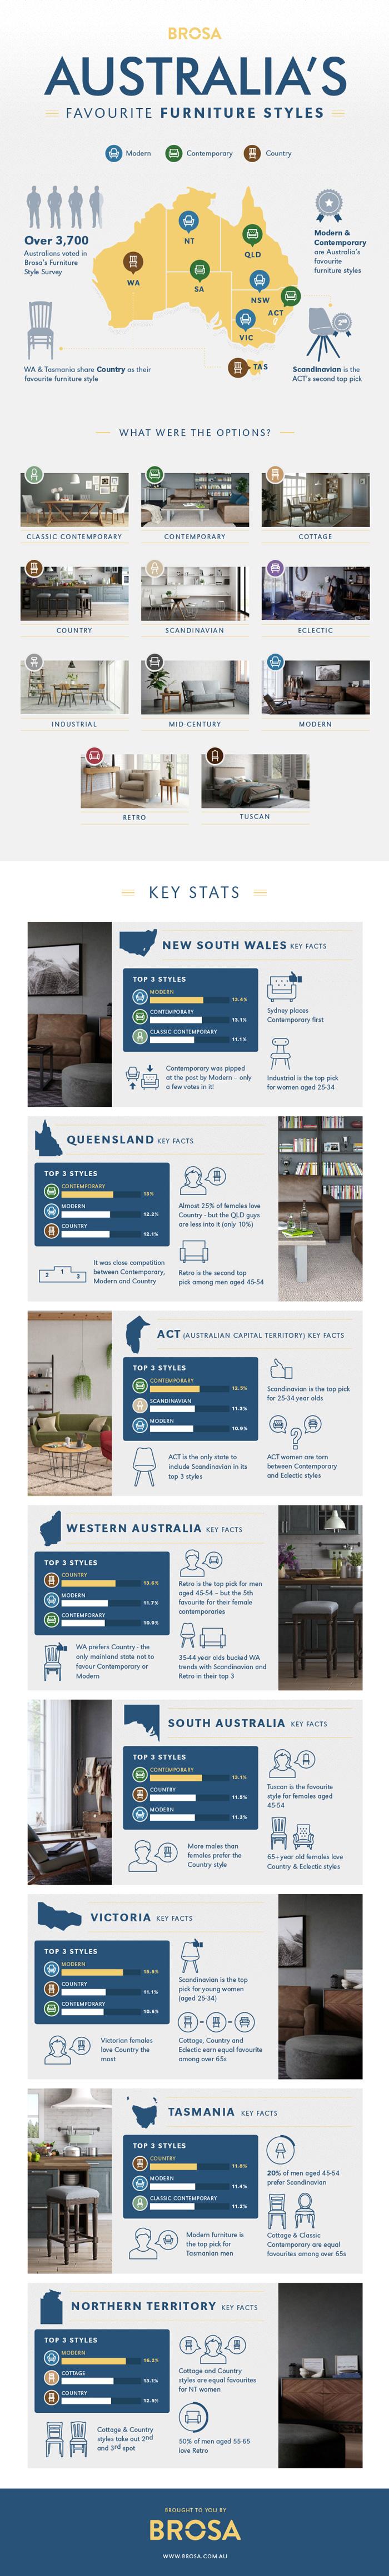 Australia's Favourite Furniture Styles Infographic